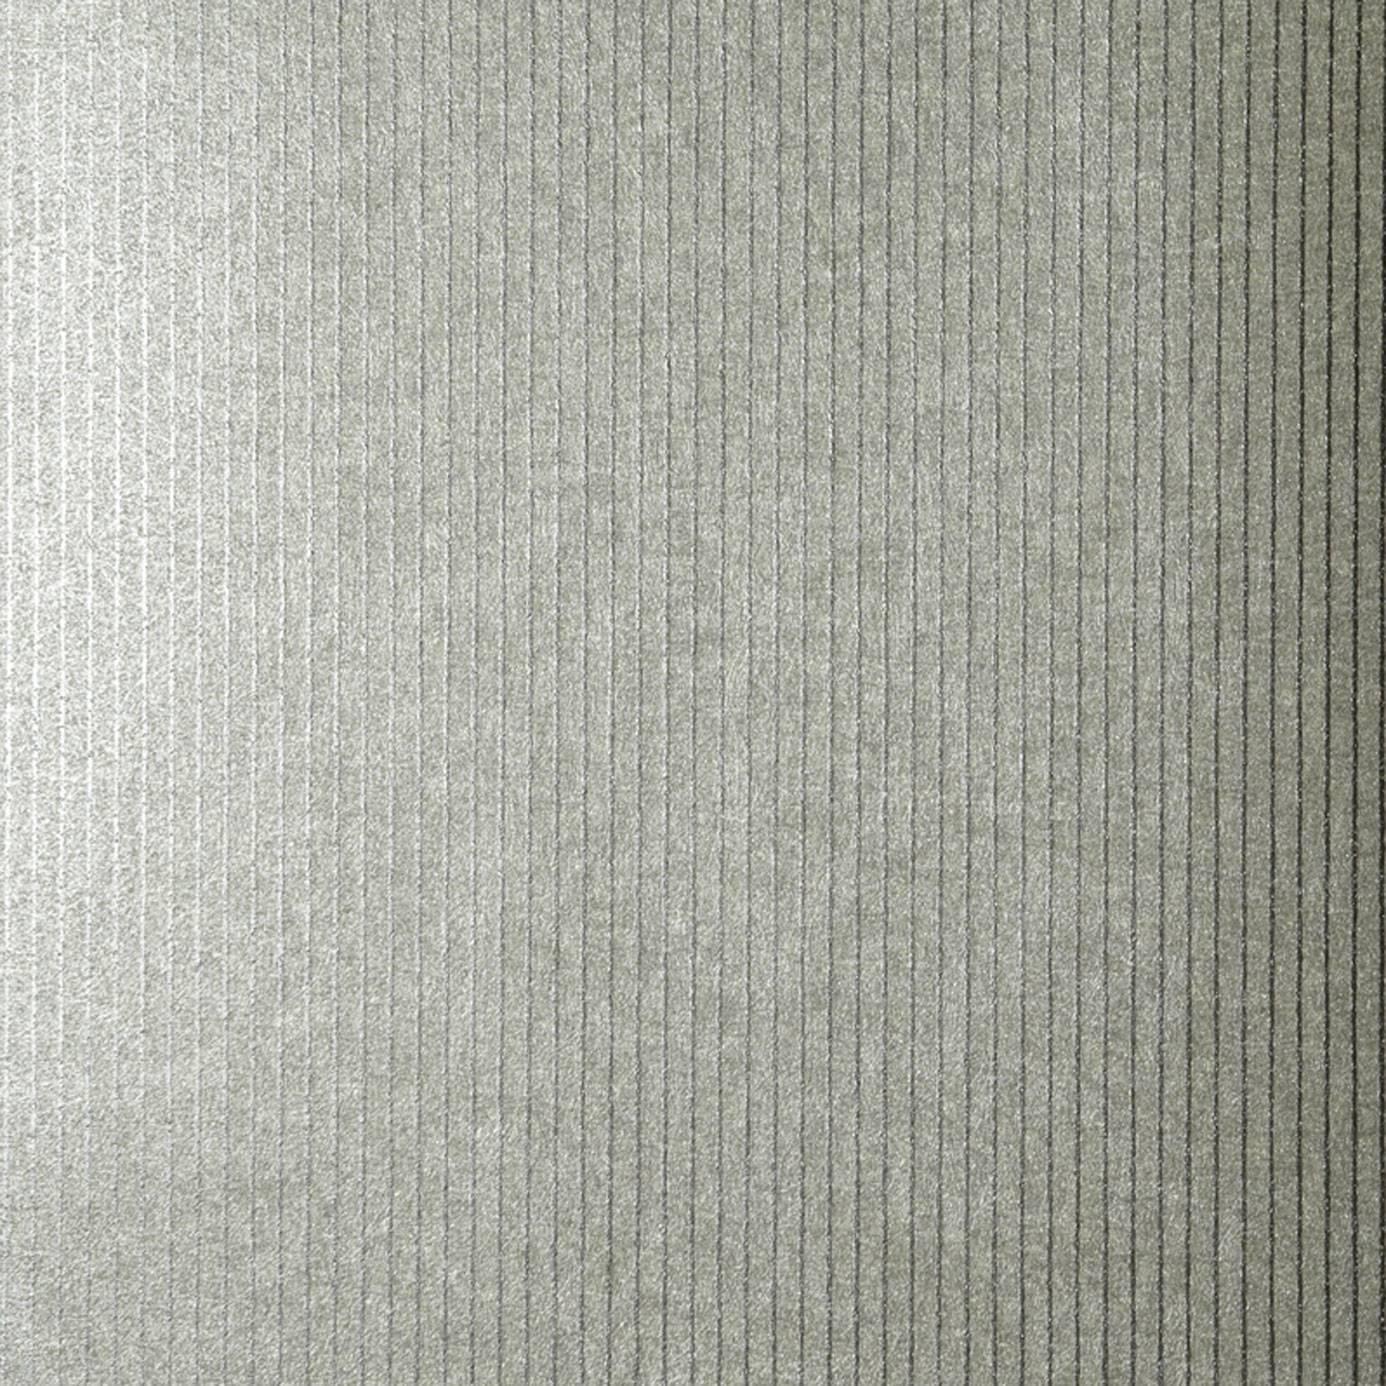 Американские обои Prestigious,  коллекция Elements, артикул1650/920